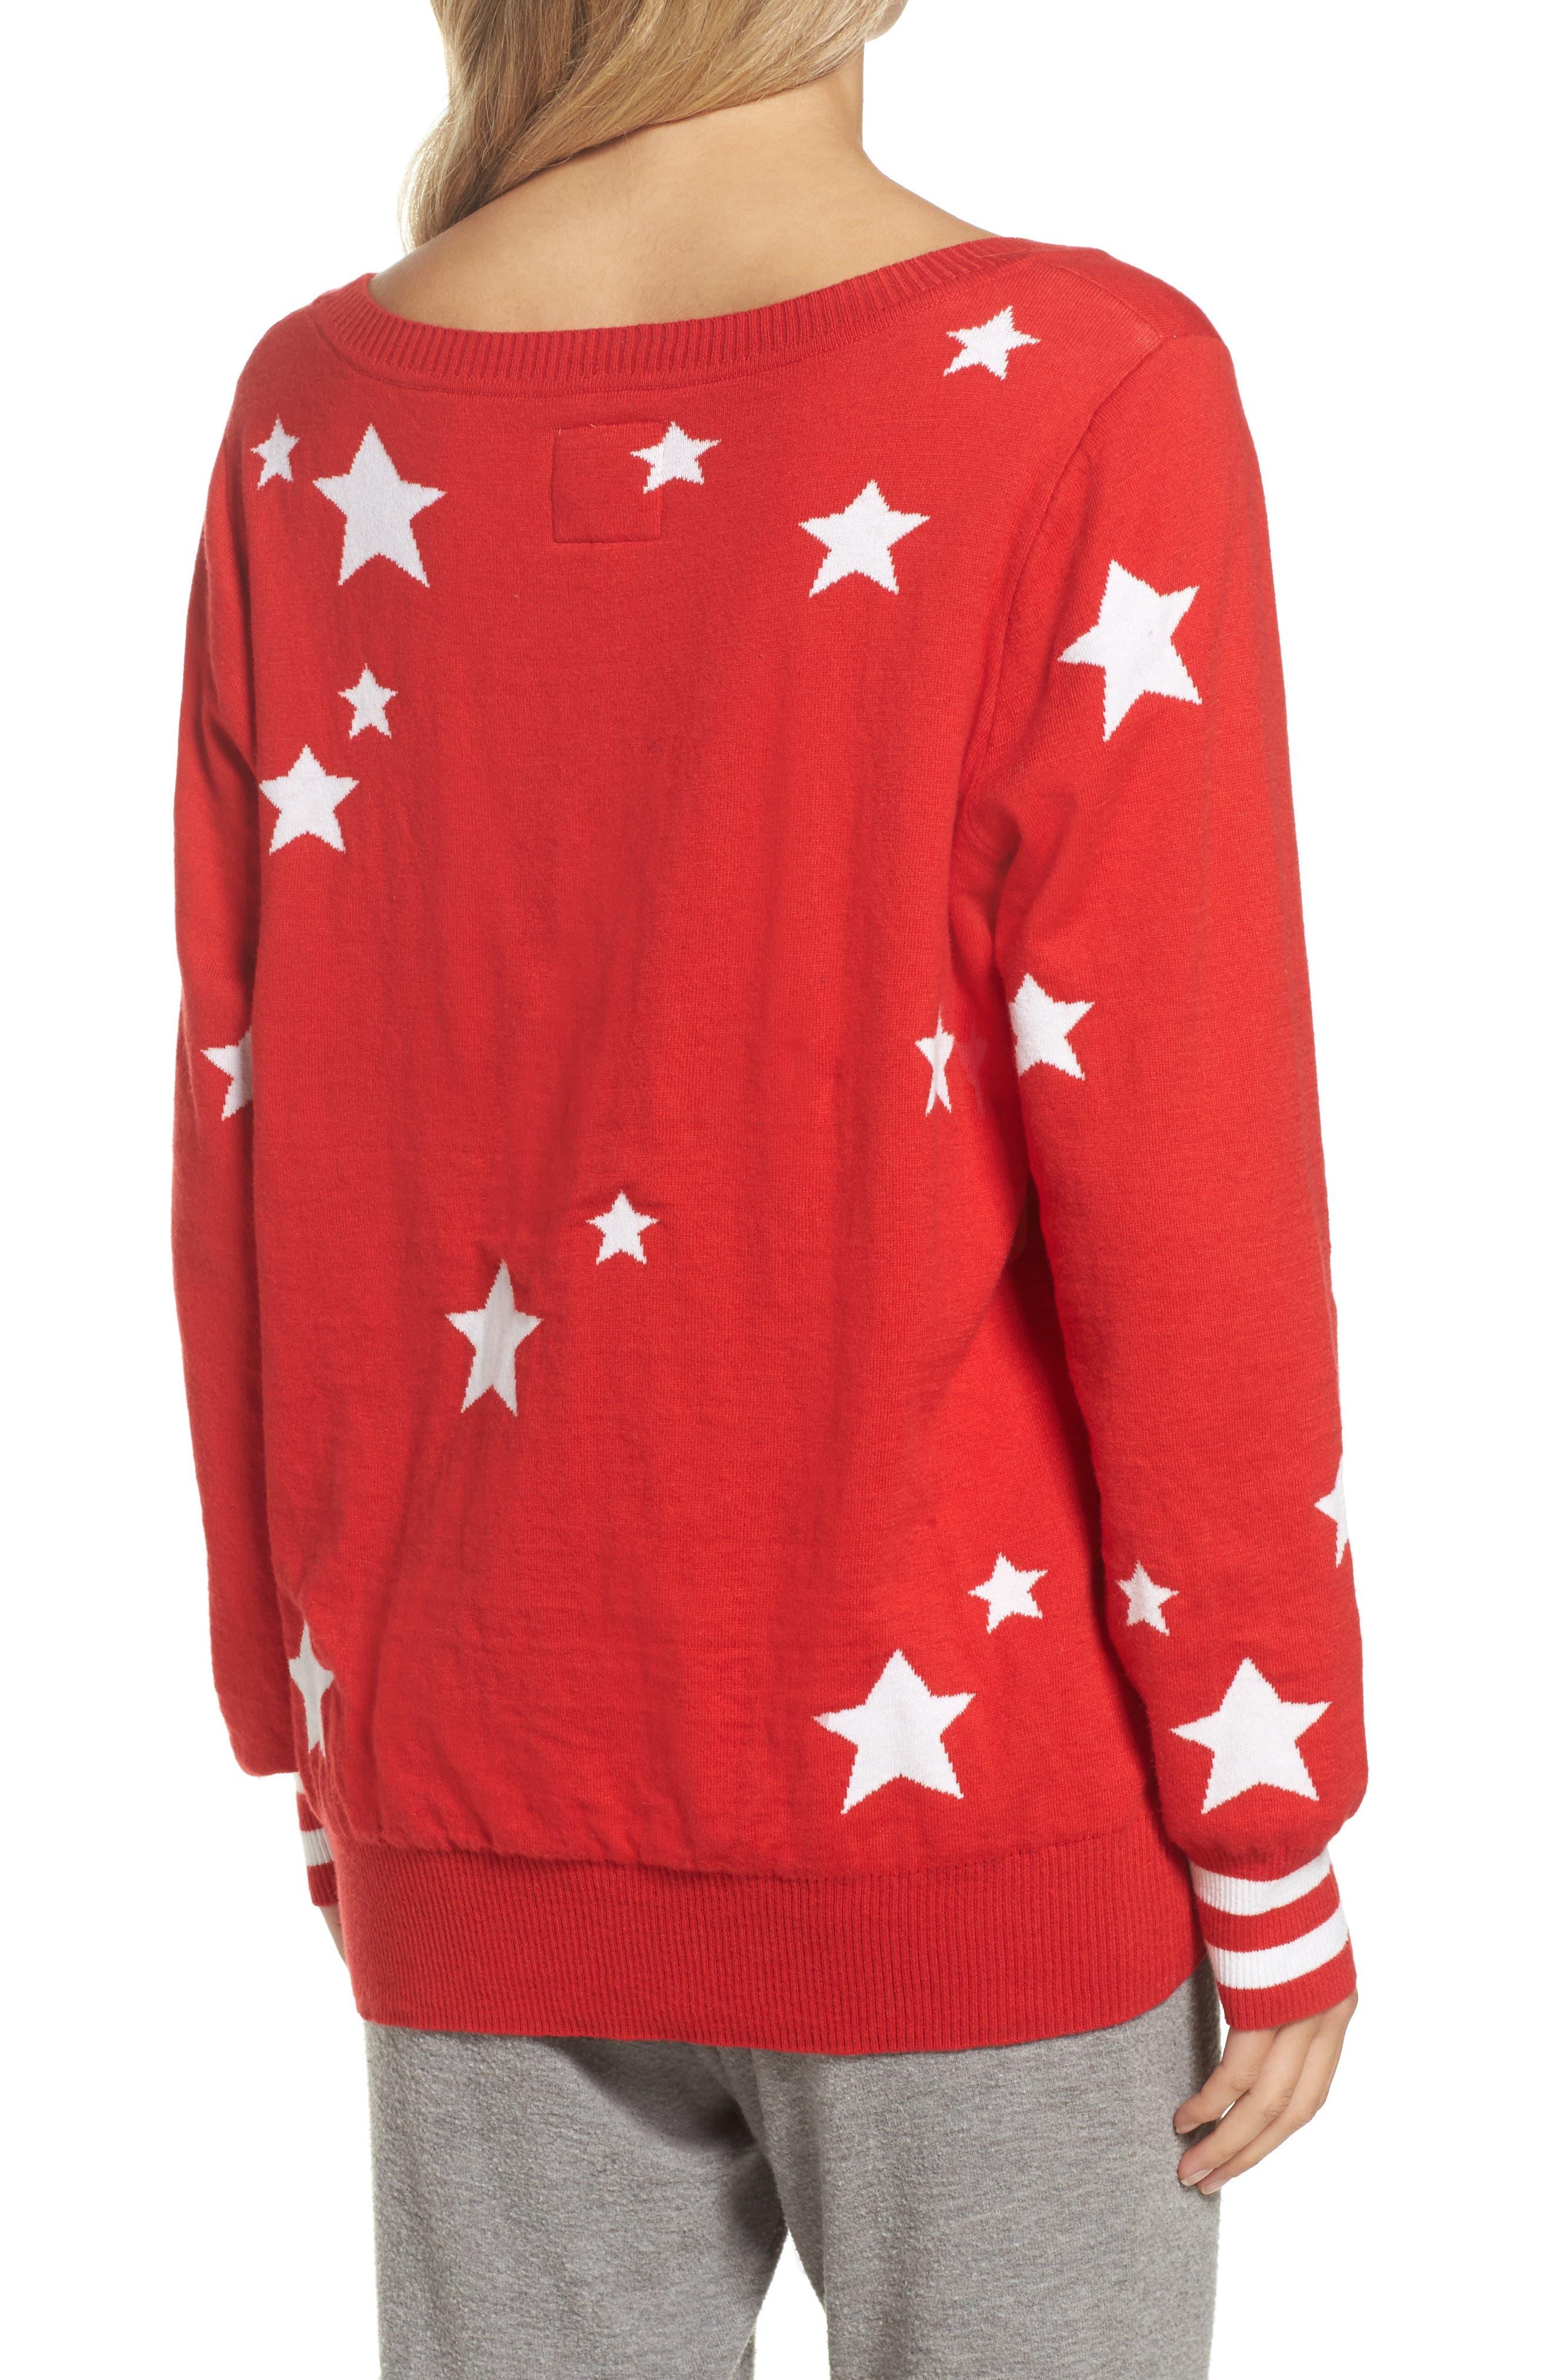 Weekends Intarsia Sweater,                             Alternate thumbnail 2, color,                             Cardinal